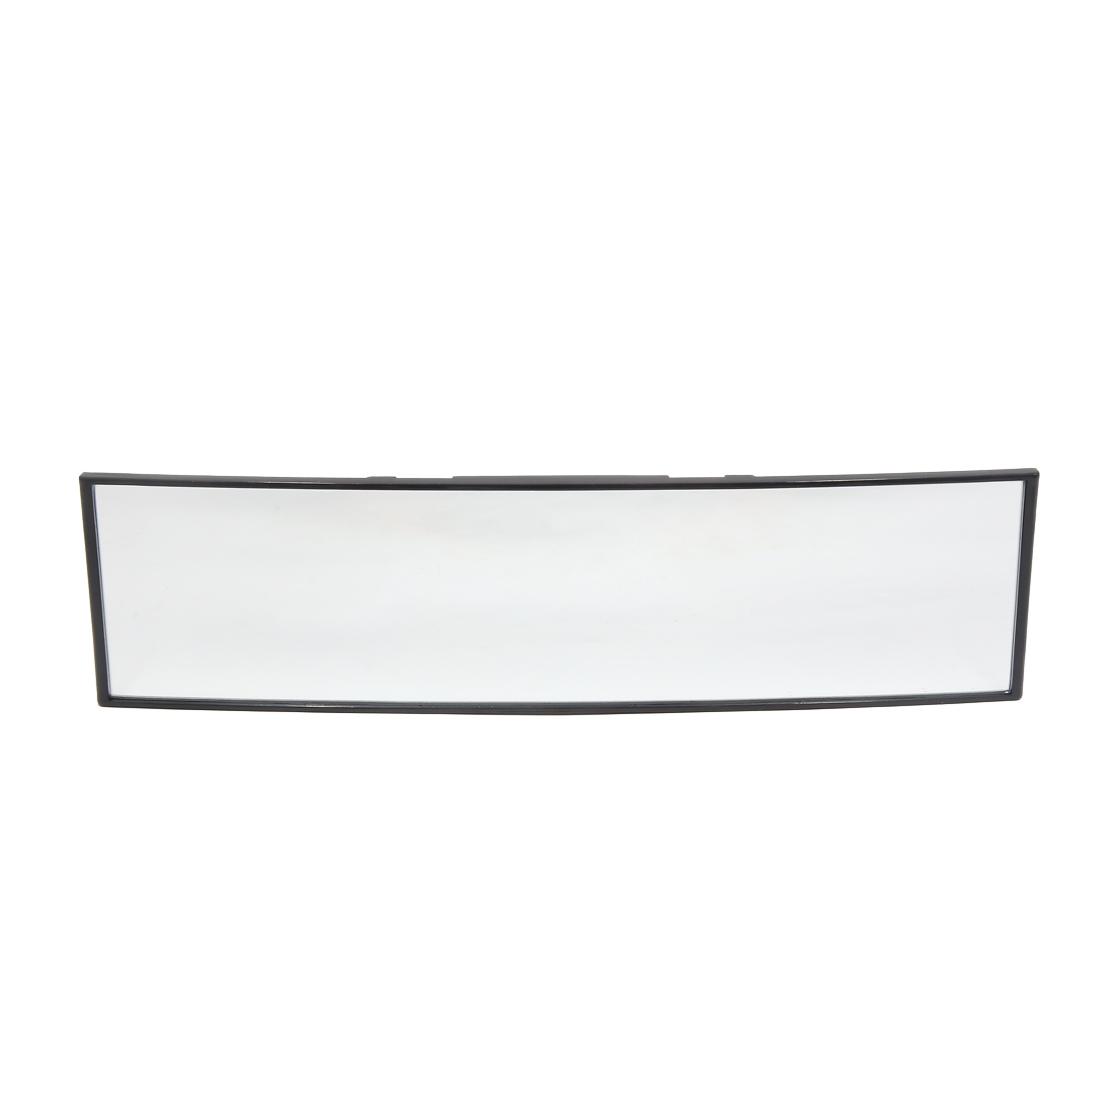 280mm Black Adjustable Curve Interior Wide Rear View Mirror for Auto Car